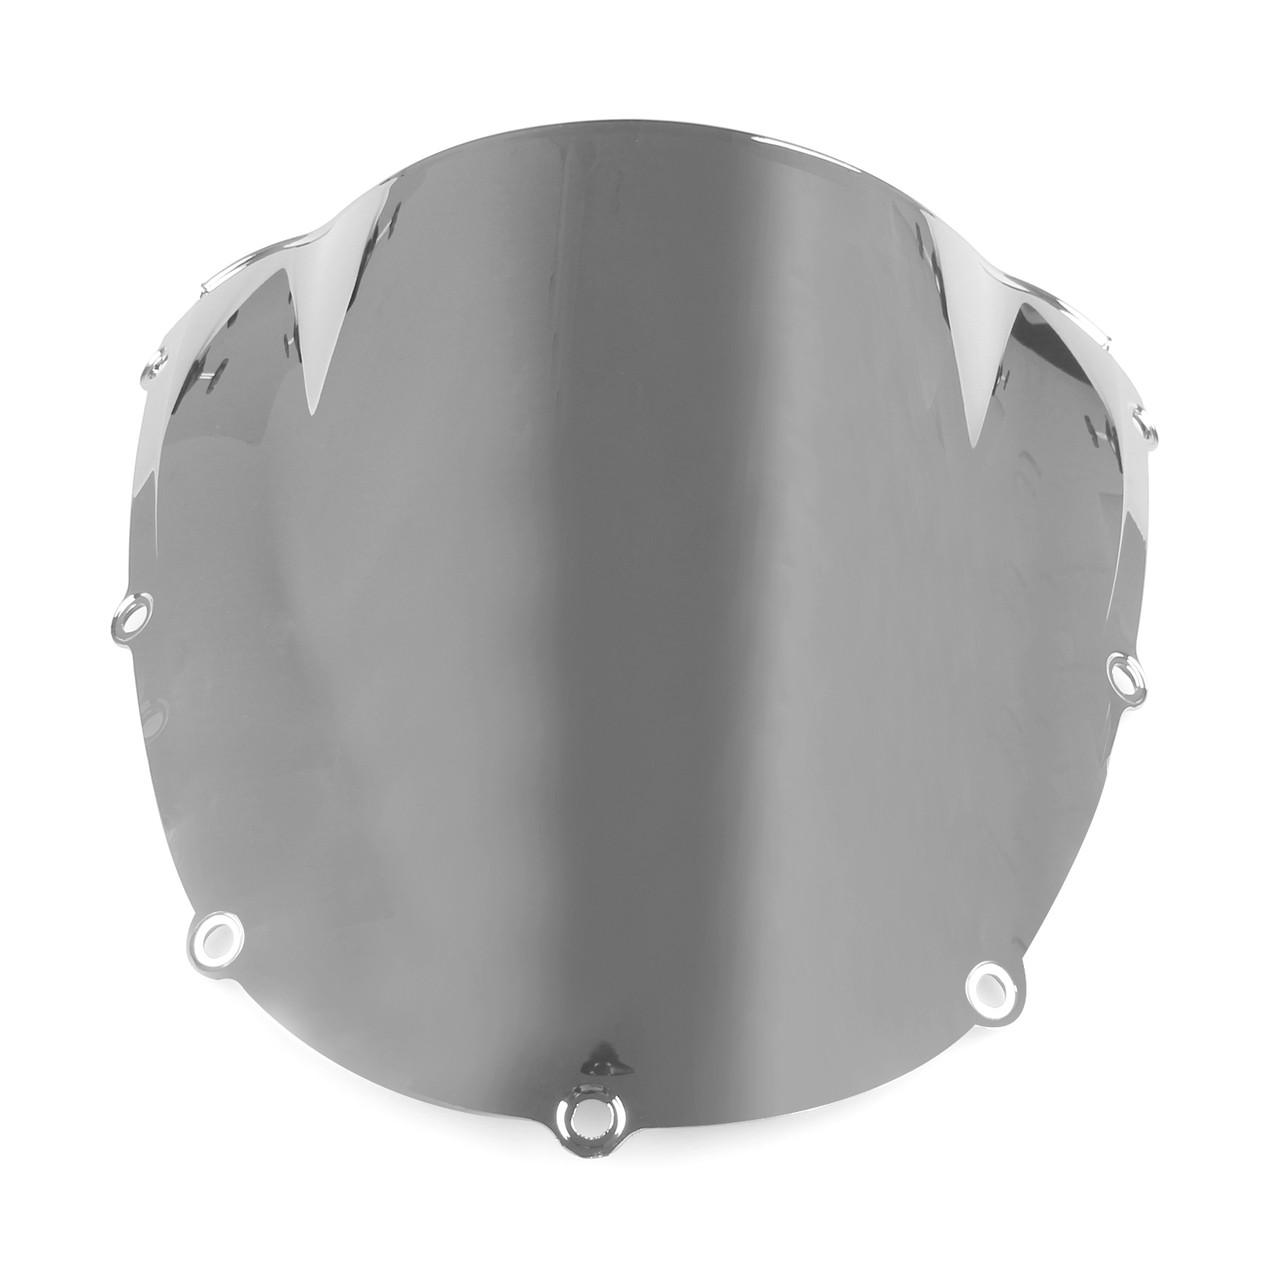 Windshield WindScreen Double Bubble For Kawasaki ZX14R ZZR1400 2006-2015 Iridium